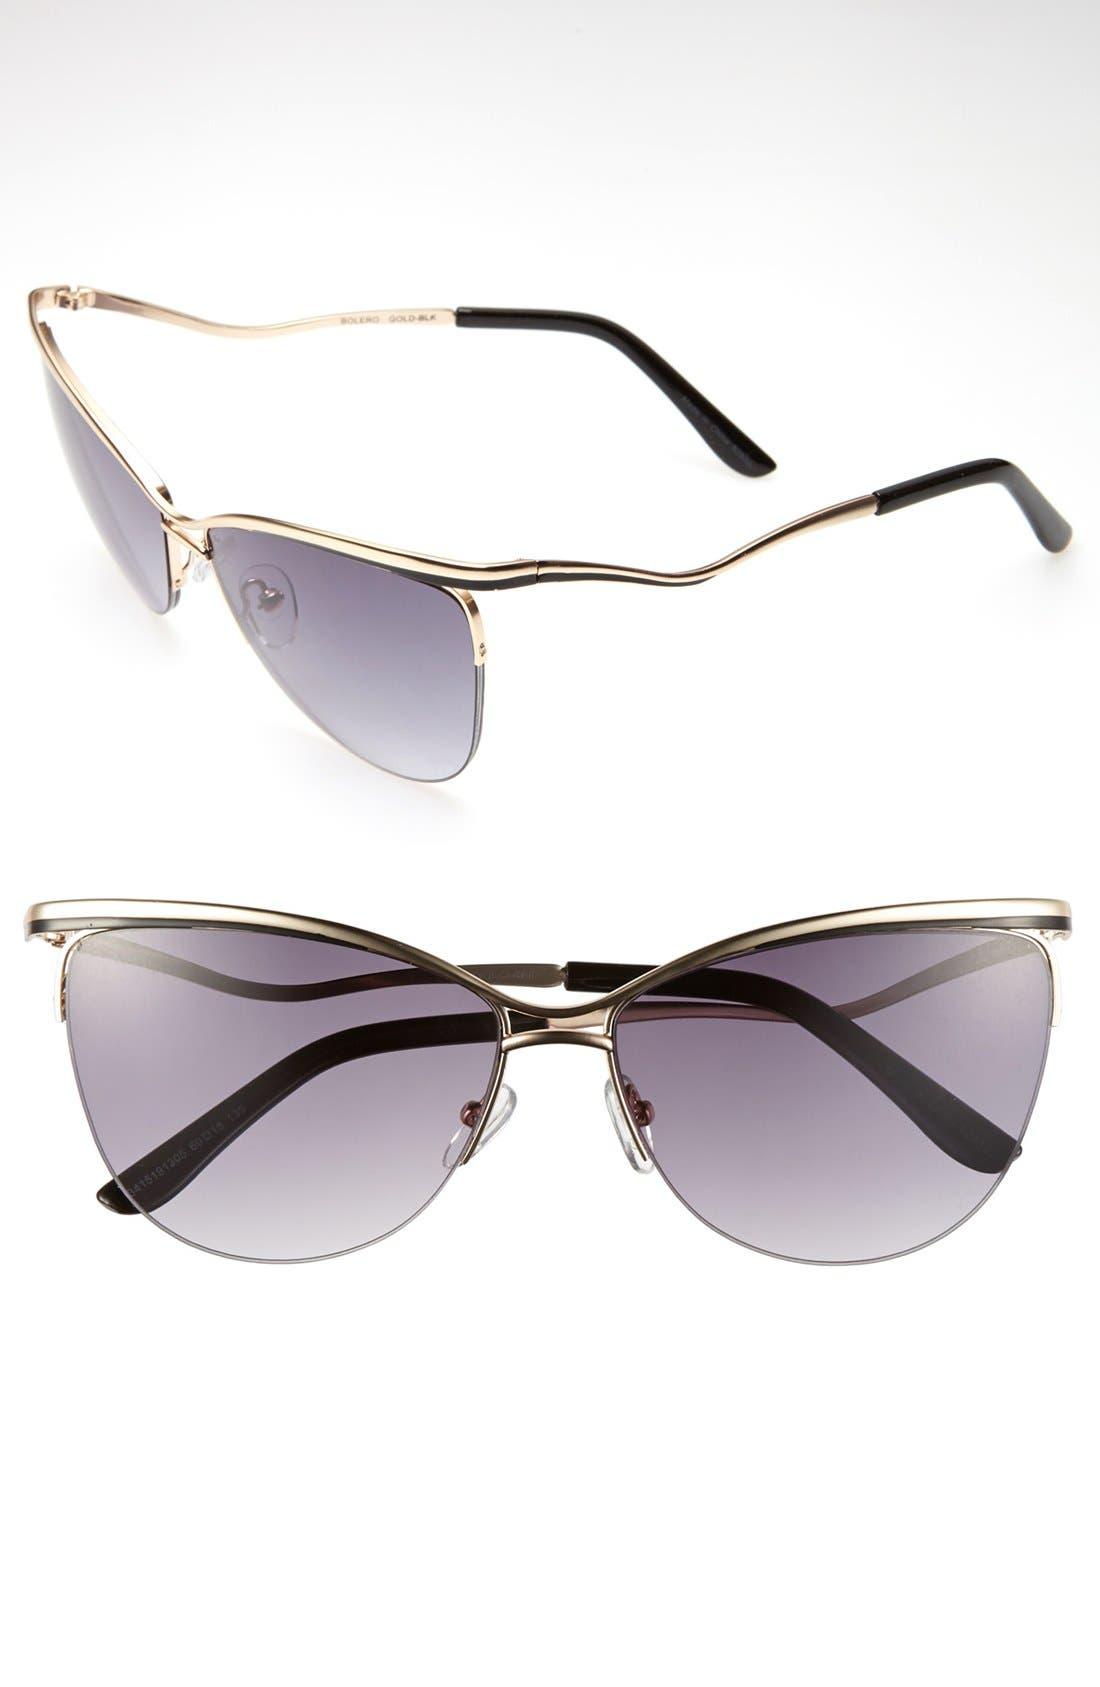 Alternate Image 1 Selected - Outlook Eyewear 'Bolero' 60mm Sunglasses